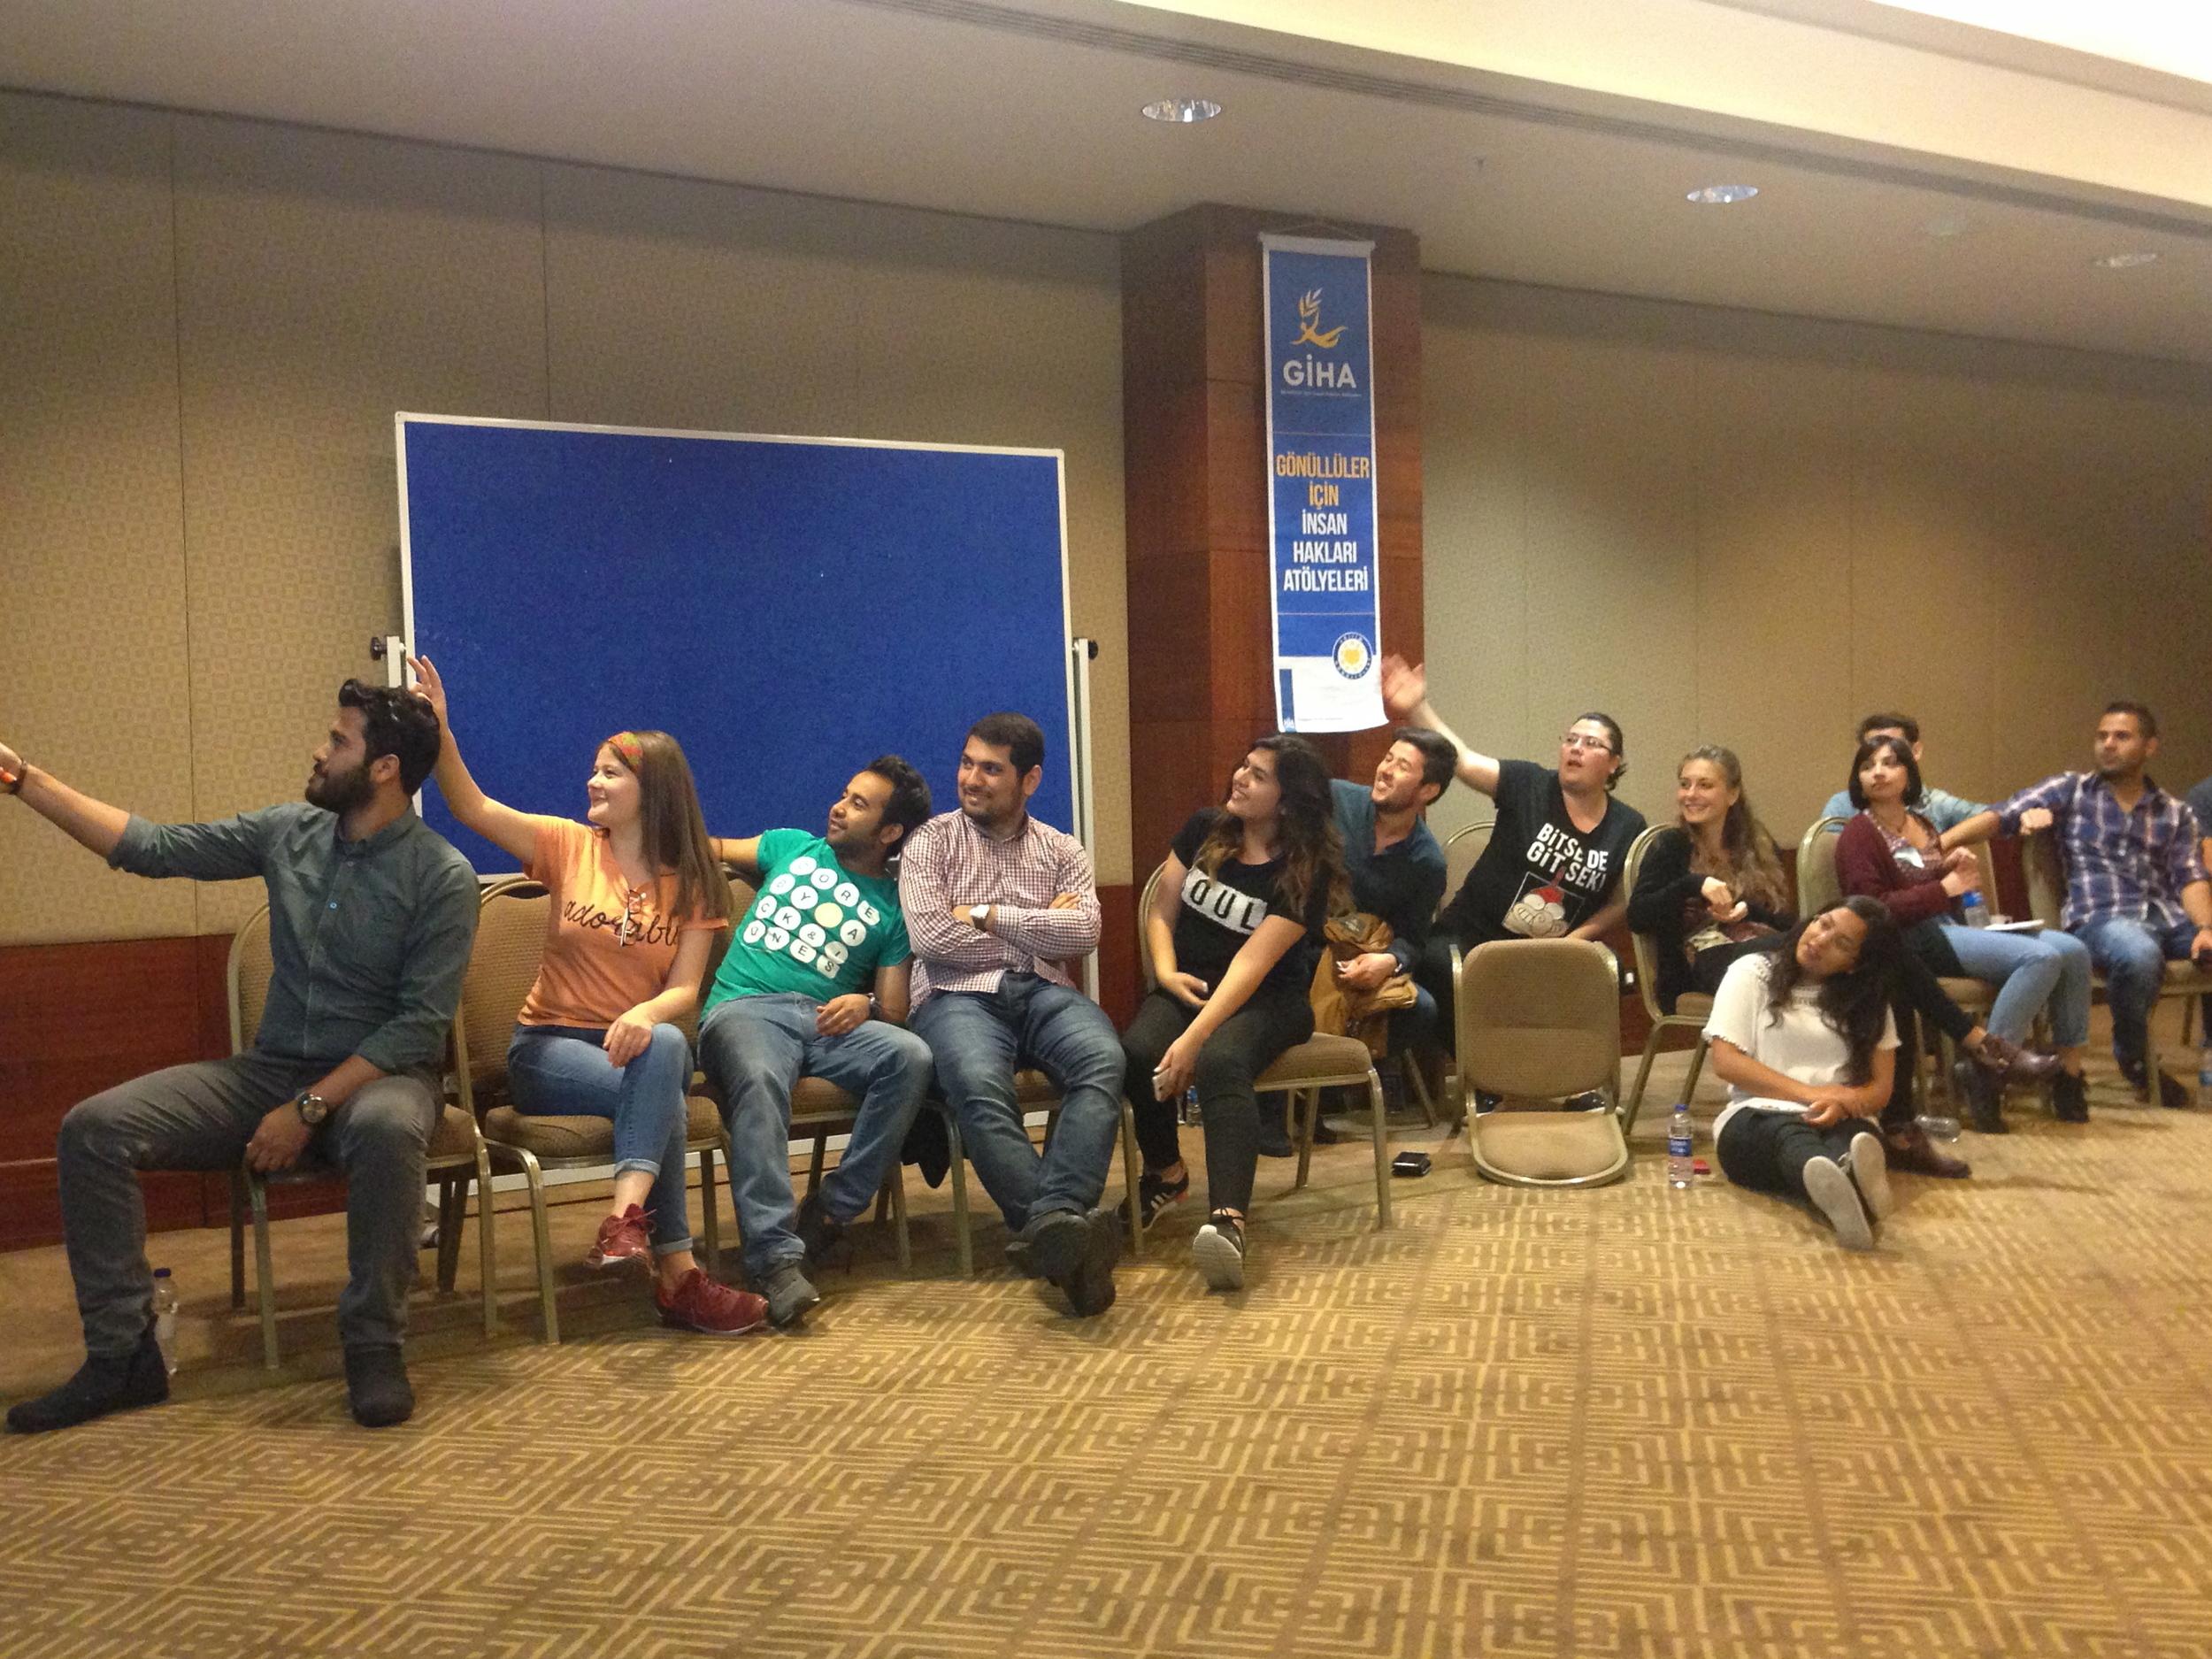 40 Attendees had come from various cities of    Turkey like  Samsun, İzmir, Giresun, Gaziantep, Antalya, İstanbul.